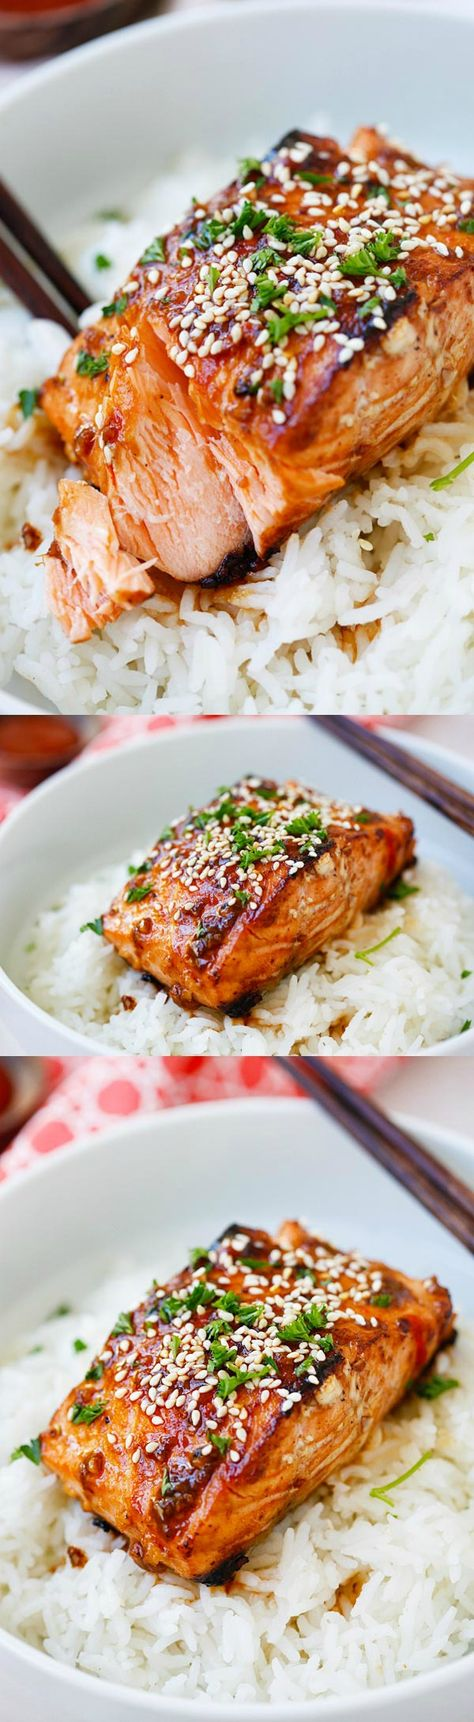 Honey Sriracha Salmon - easy, spicy, sweet, and savory, this glazed salmon recipe is awesome | rasamalaysia.com #mothersday